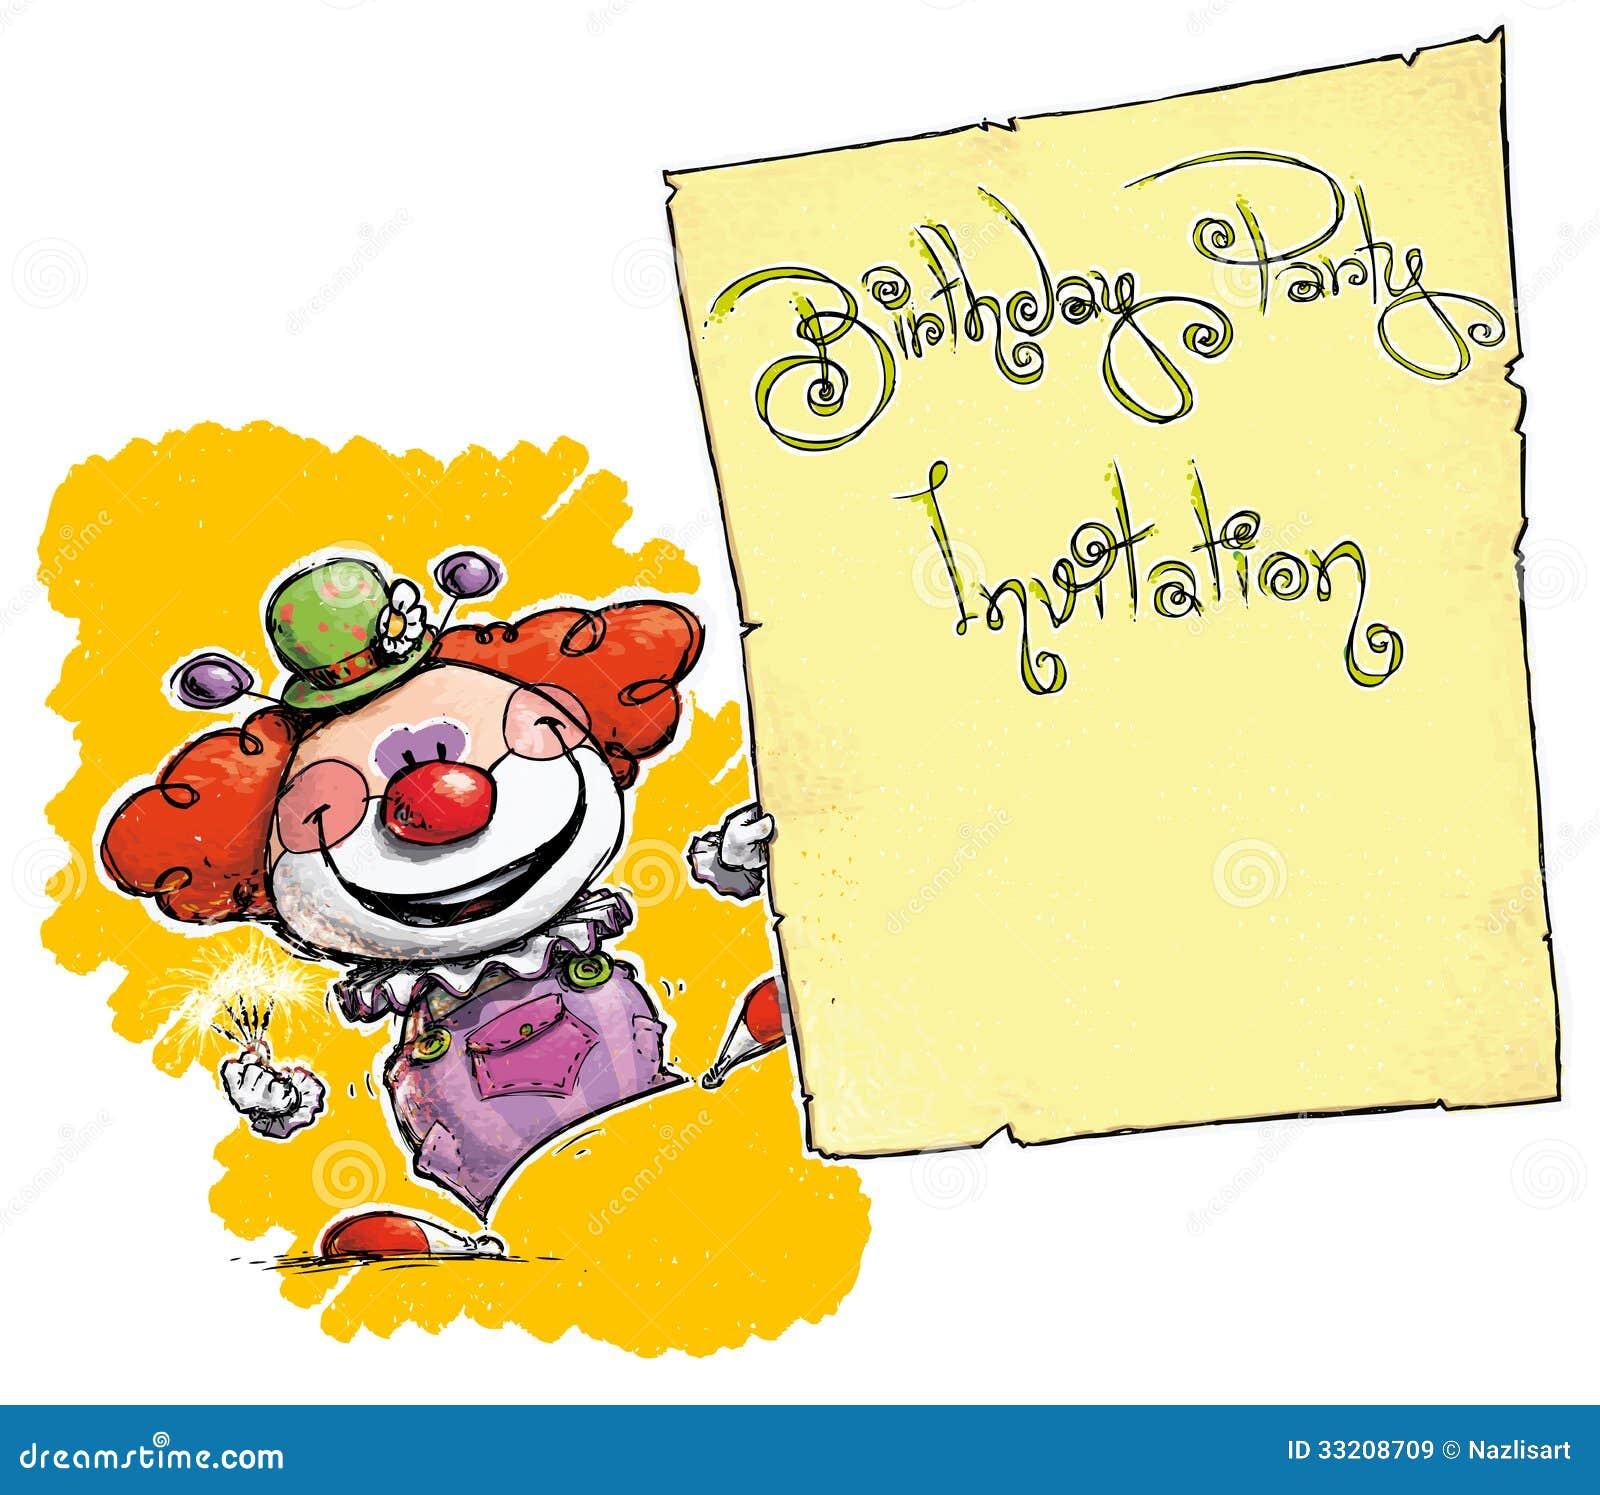 Palhao holding invitation birthday party ilustrao do vetor download palhao holding invitation birthday party ilustrao do vetor ilustrao de falsificao holding stopboris Gallery